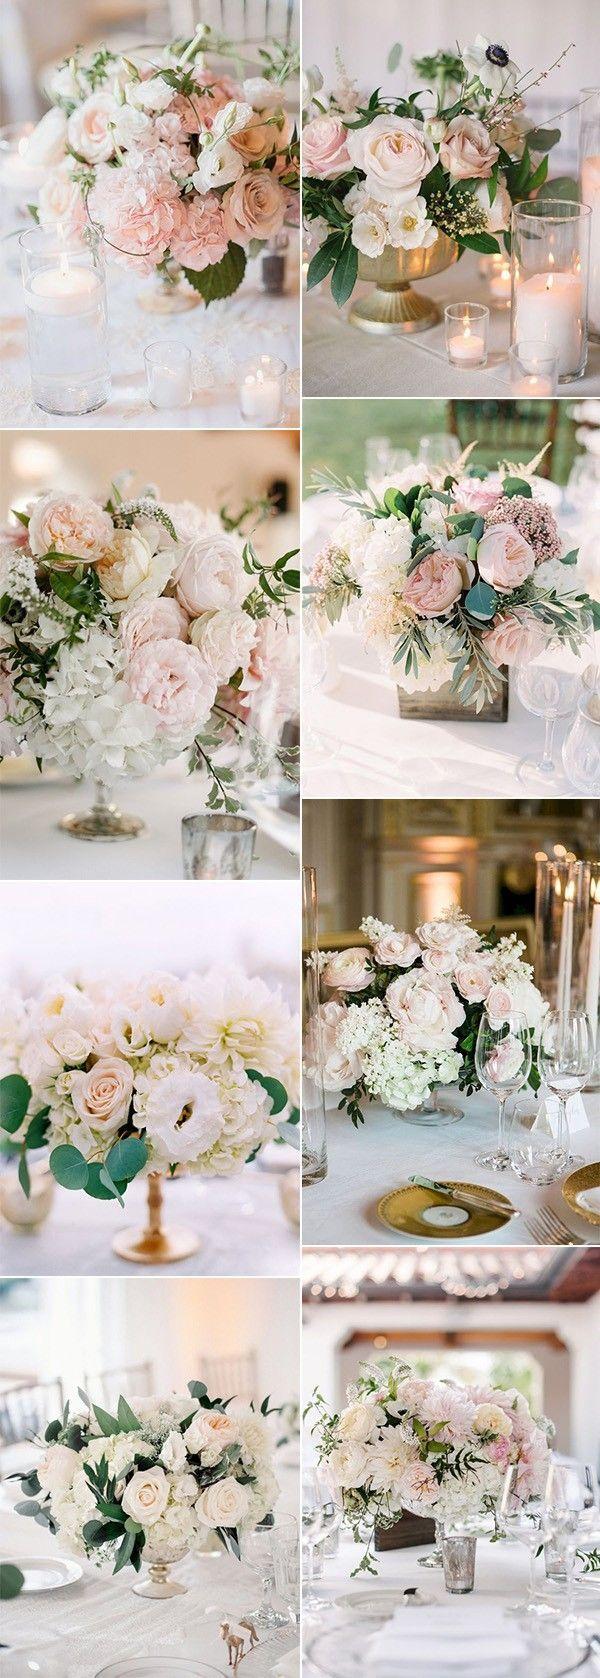 15 Elegant Blush Pink Wedding Centerpieces for 2019 – darini denise